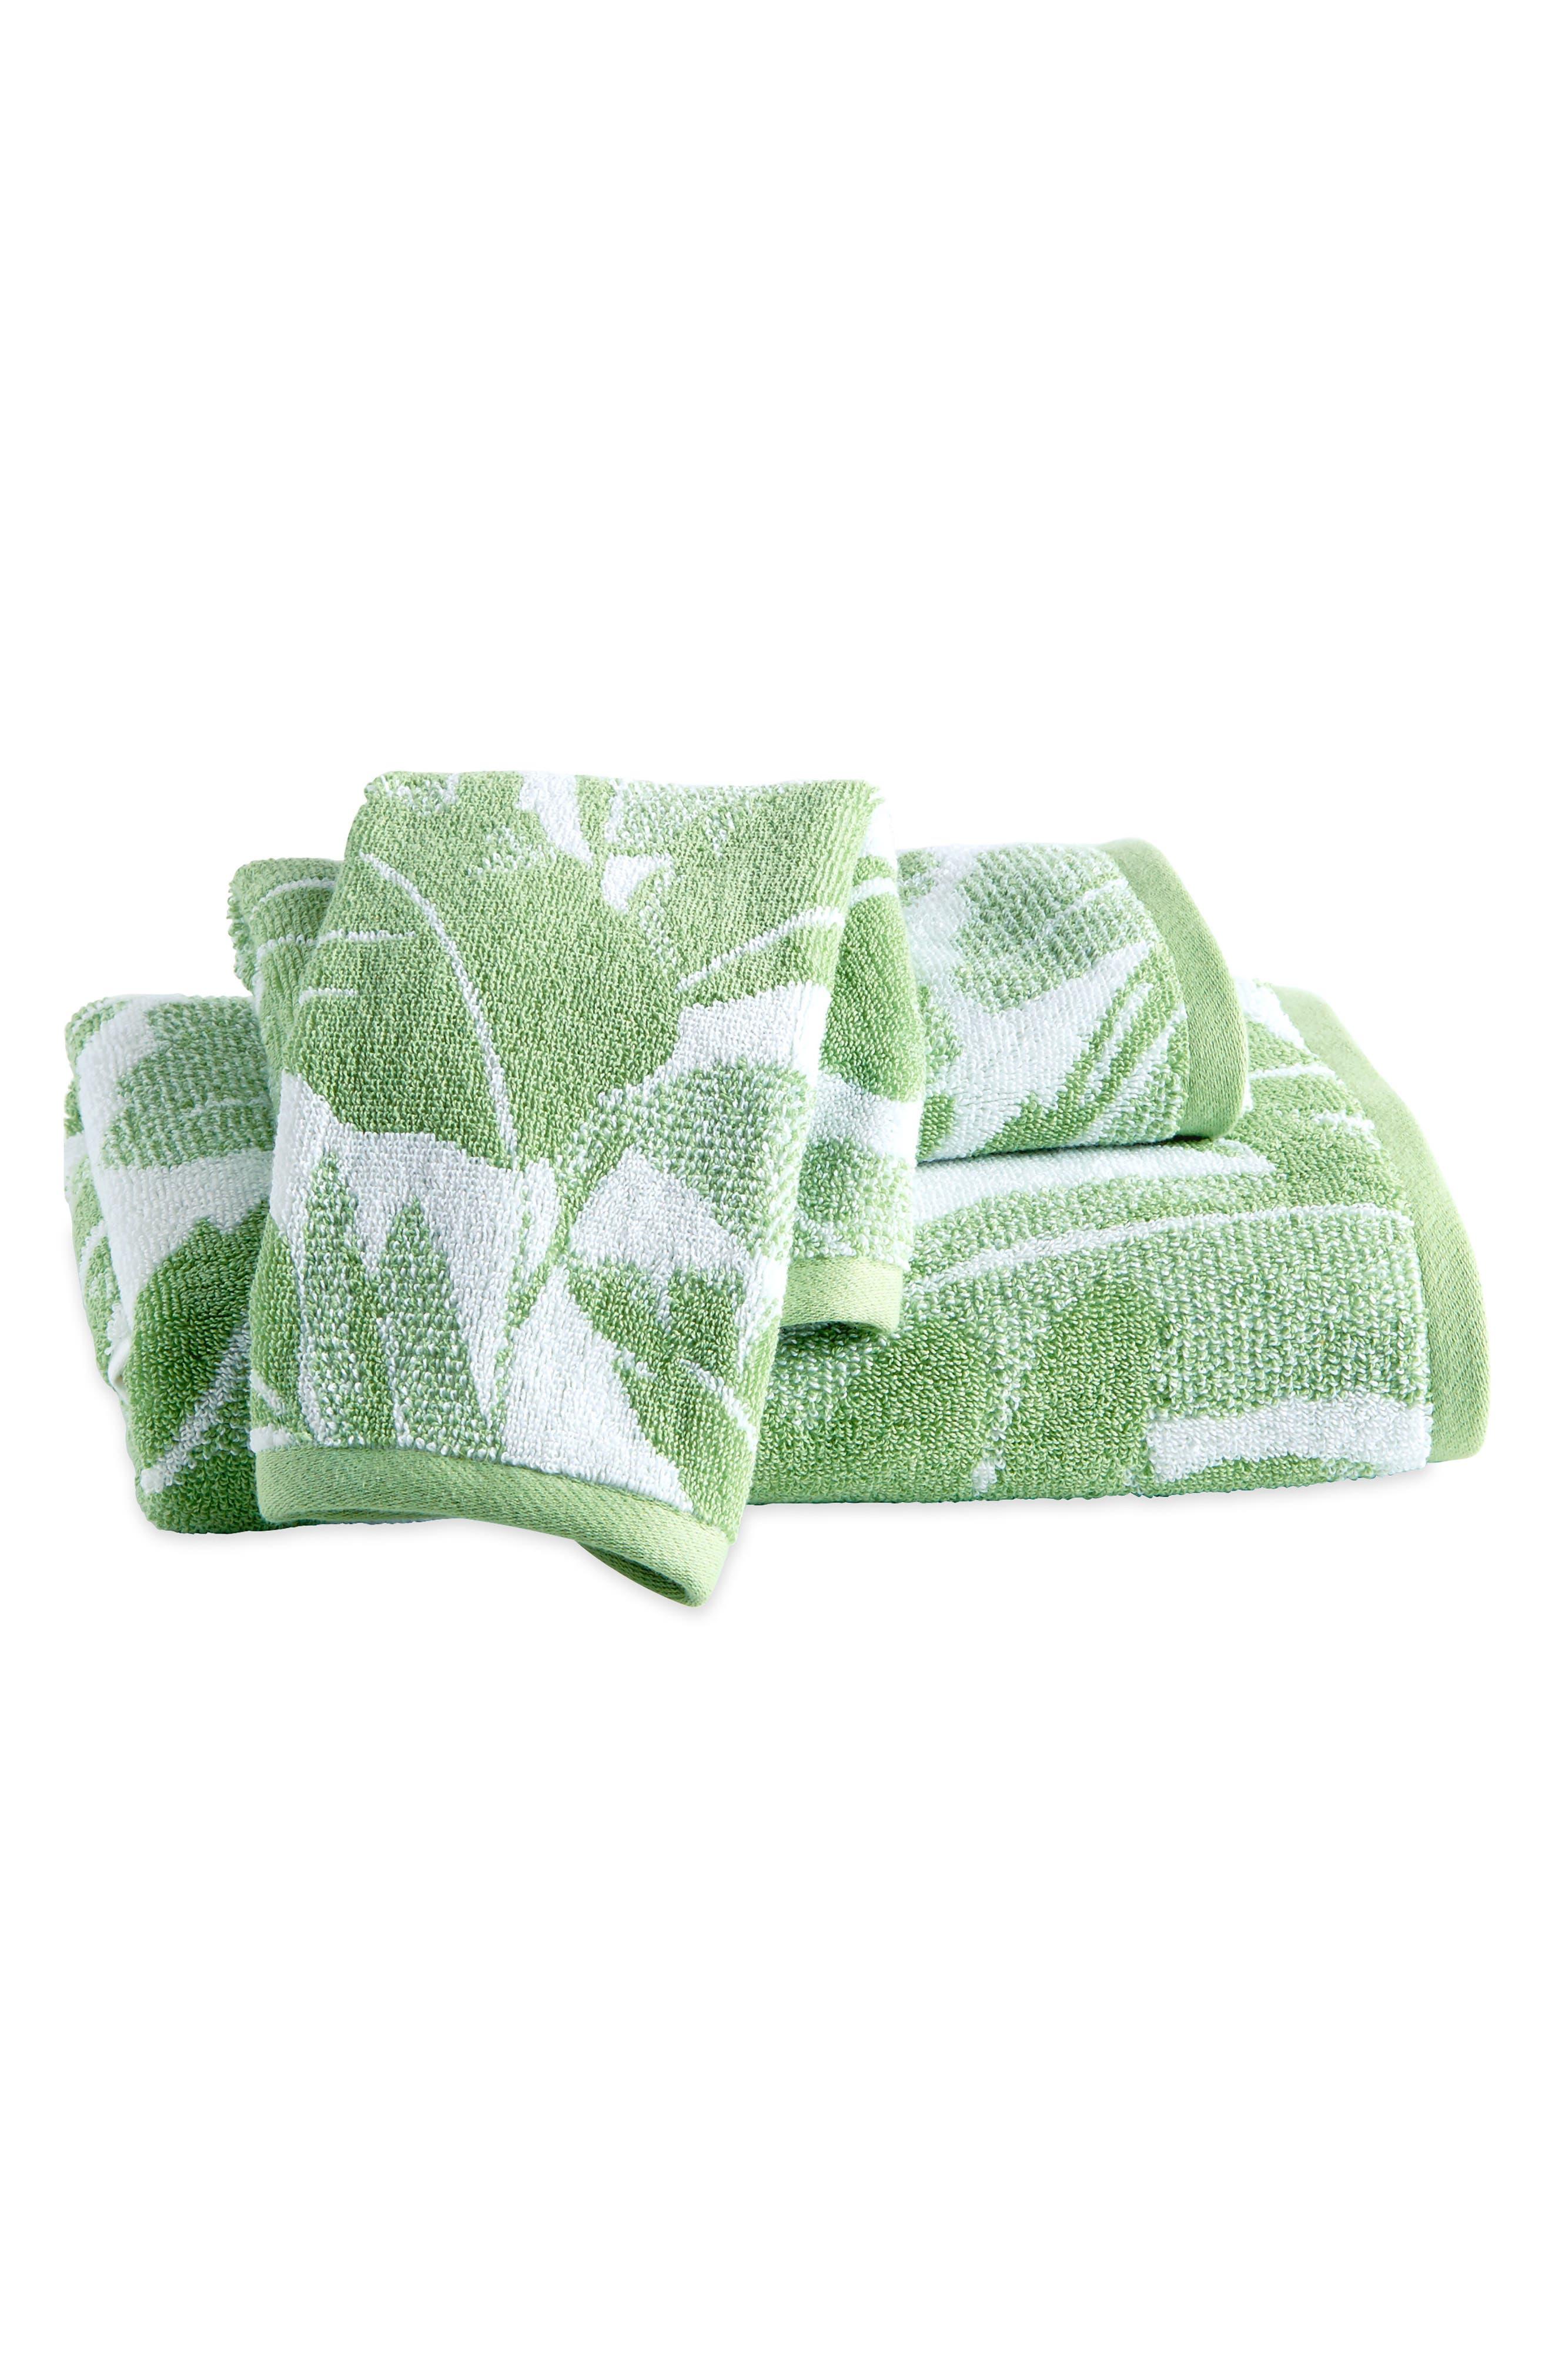 Miami Leaf Bath Towel, Hand Towel and Finger Towel Set,                             Main thumbnail 1, color,